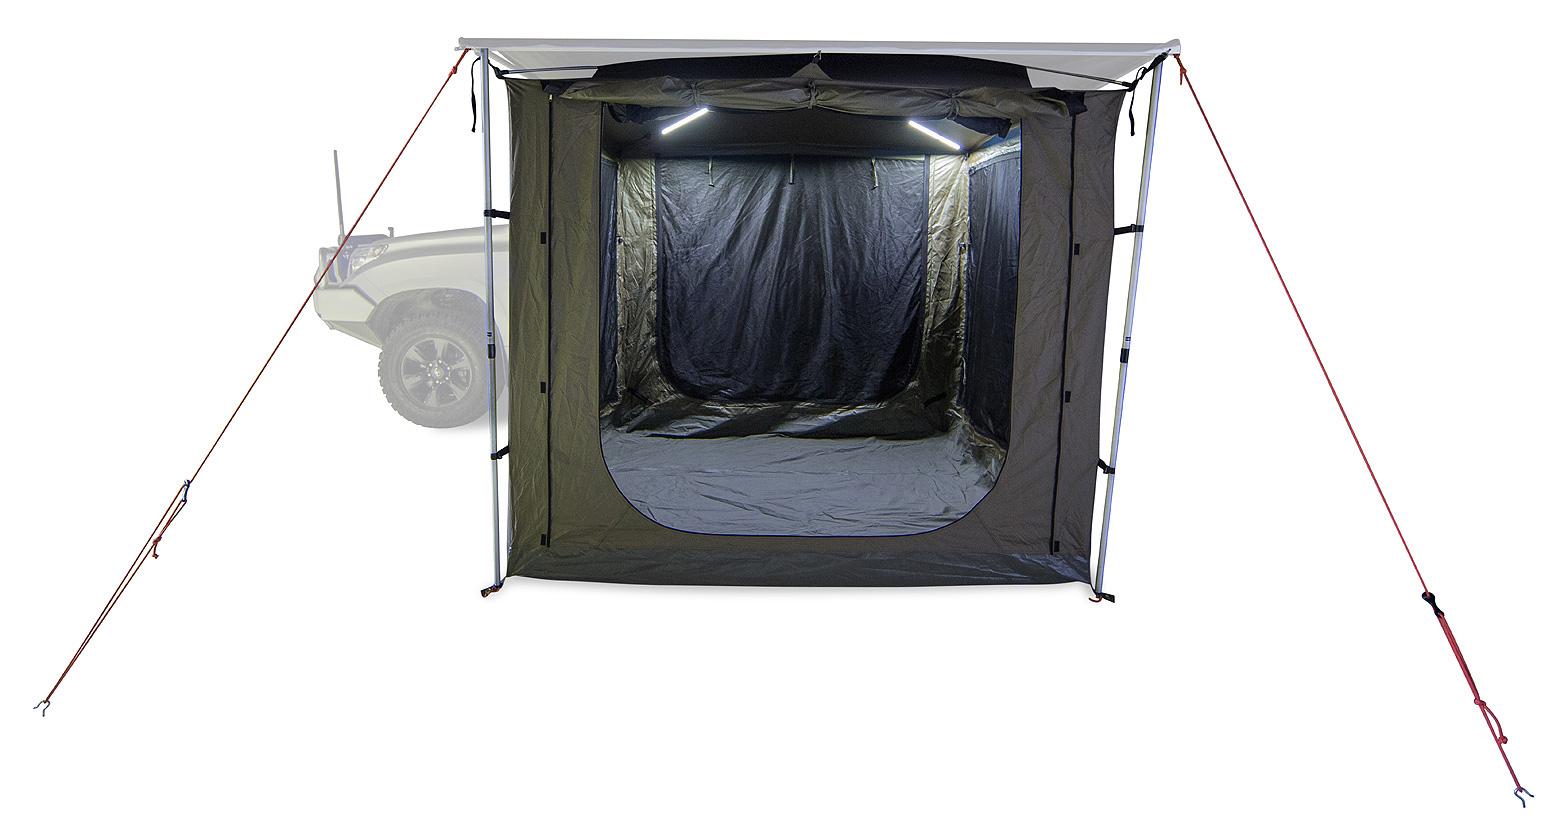 Sunseeker 2.5m Base Tent - #32119   Rhino-Rack  sc 1 st  Rhino-Rack & Base Tent 2500 - #32119   Rhino-Rack